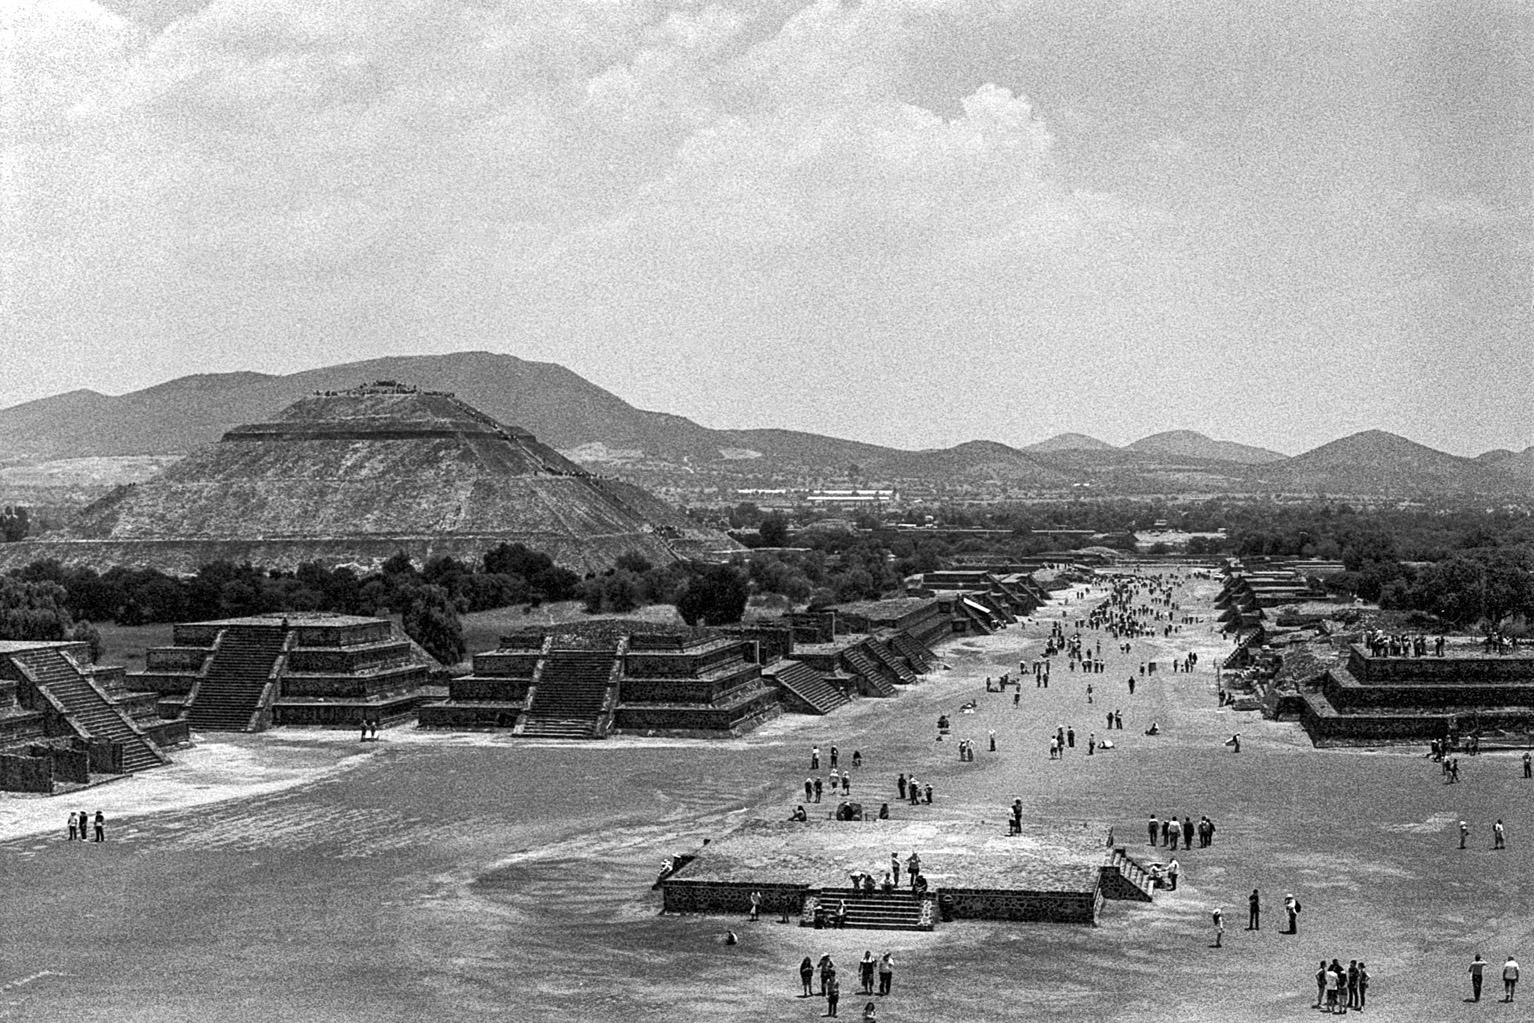 20190523_MexicoCIty_M5-KodakTrix400_008-Edit.jpg